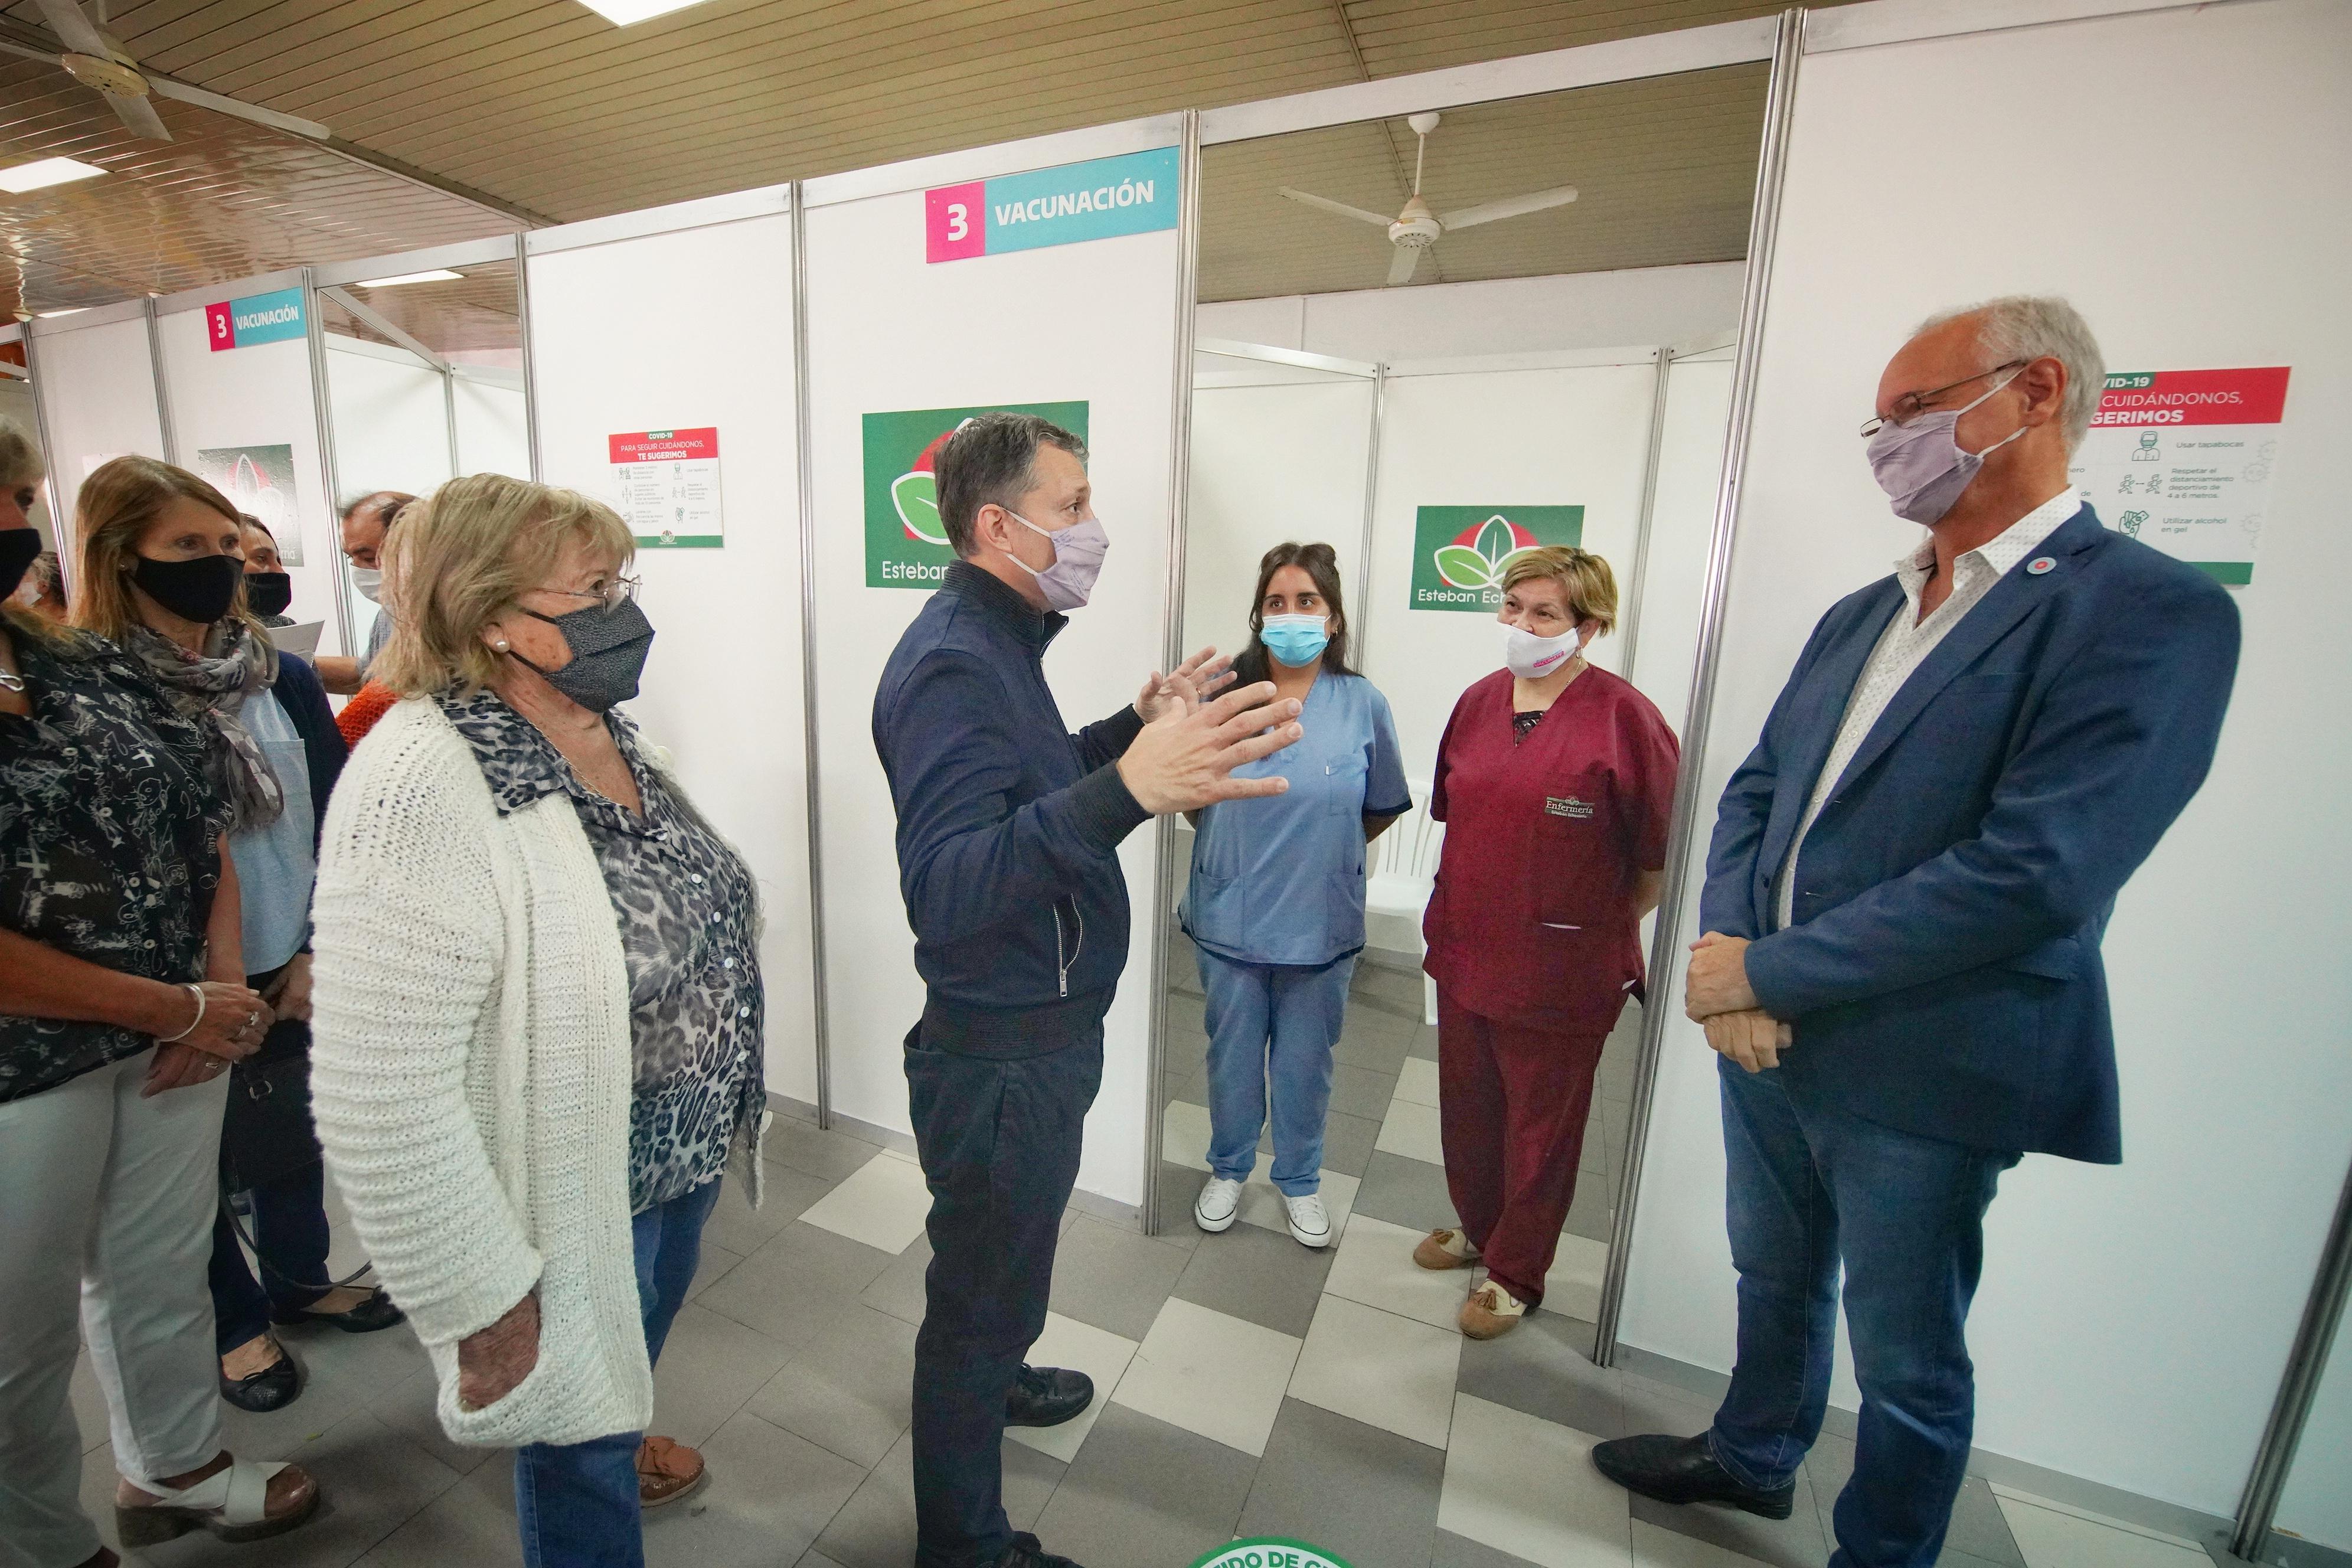 Suman nuevos contenedores para guardar vacunas contra coronavirus en Esteban Echeverría